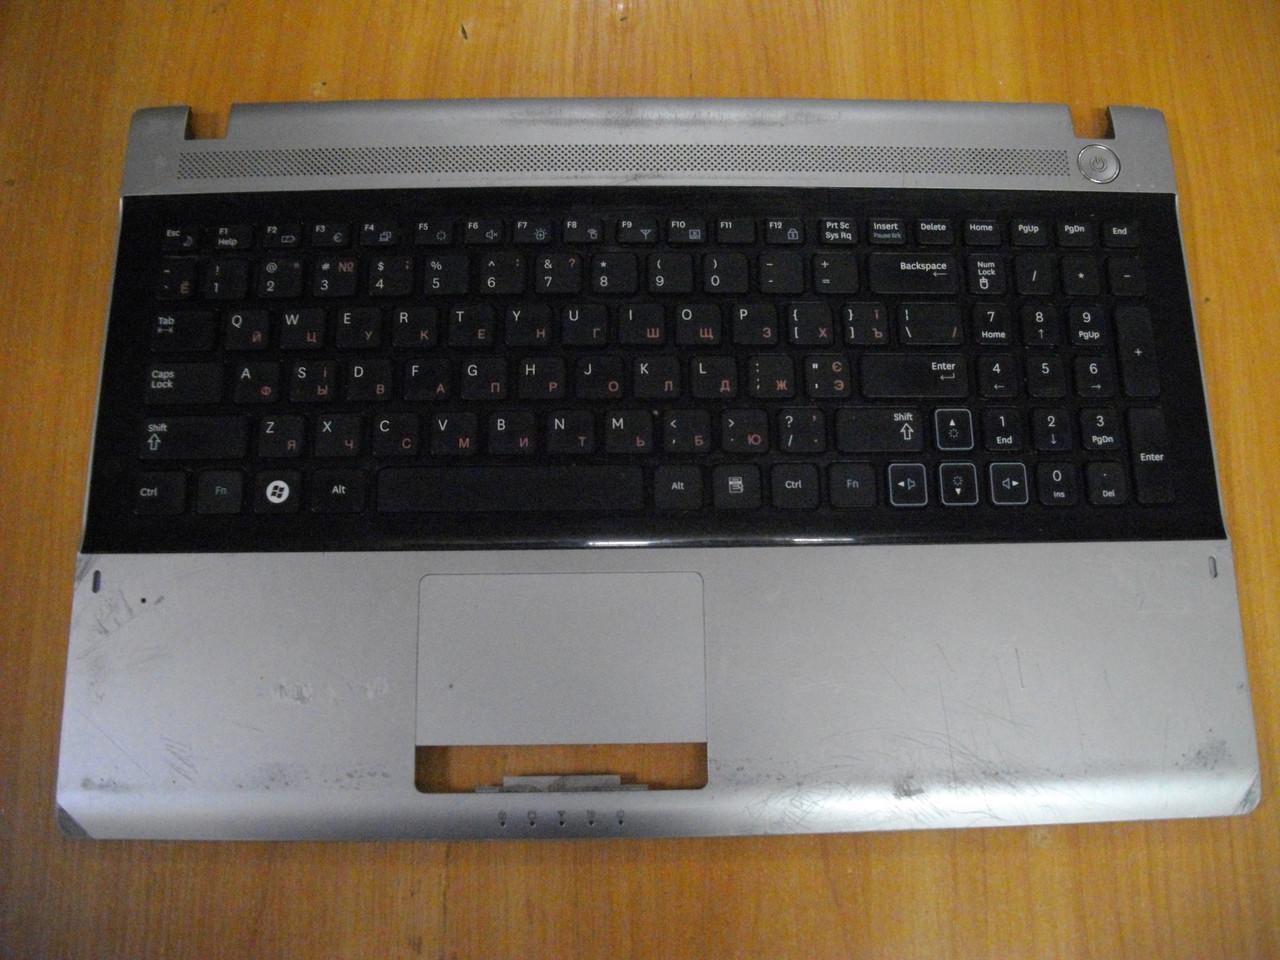 Корпус Клавиатура с верхней частью корпуса топкейс Samsung NP-RV509, RV509 бу